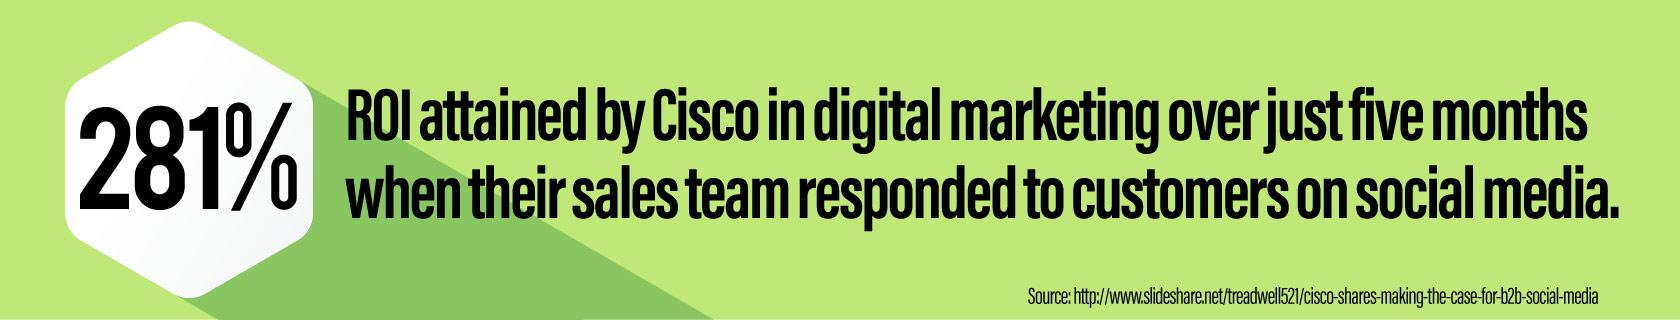 281% Digital Marketing ROI